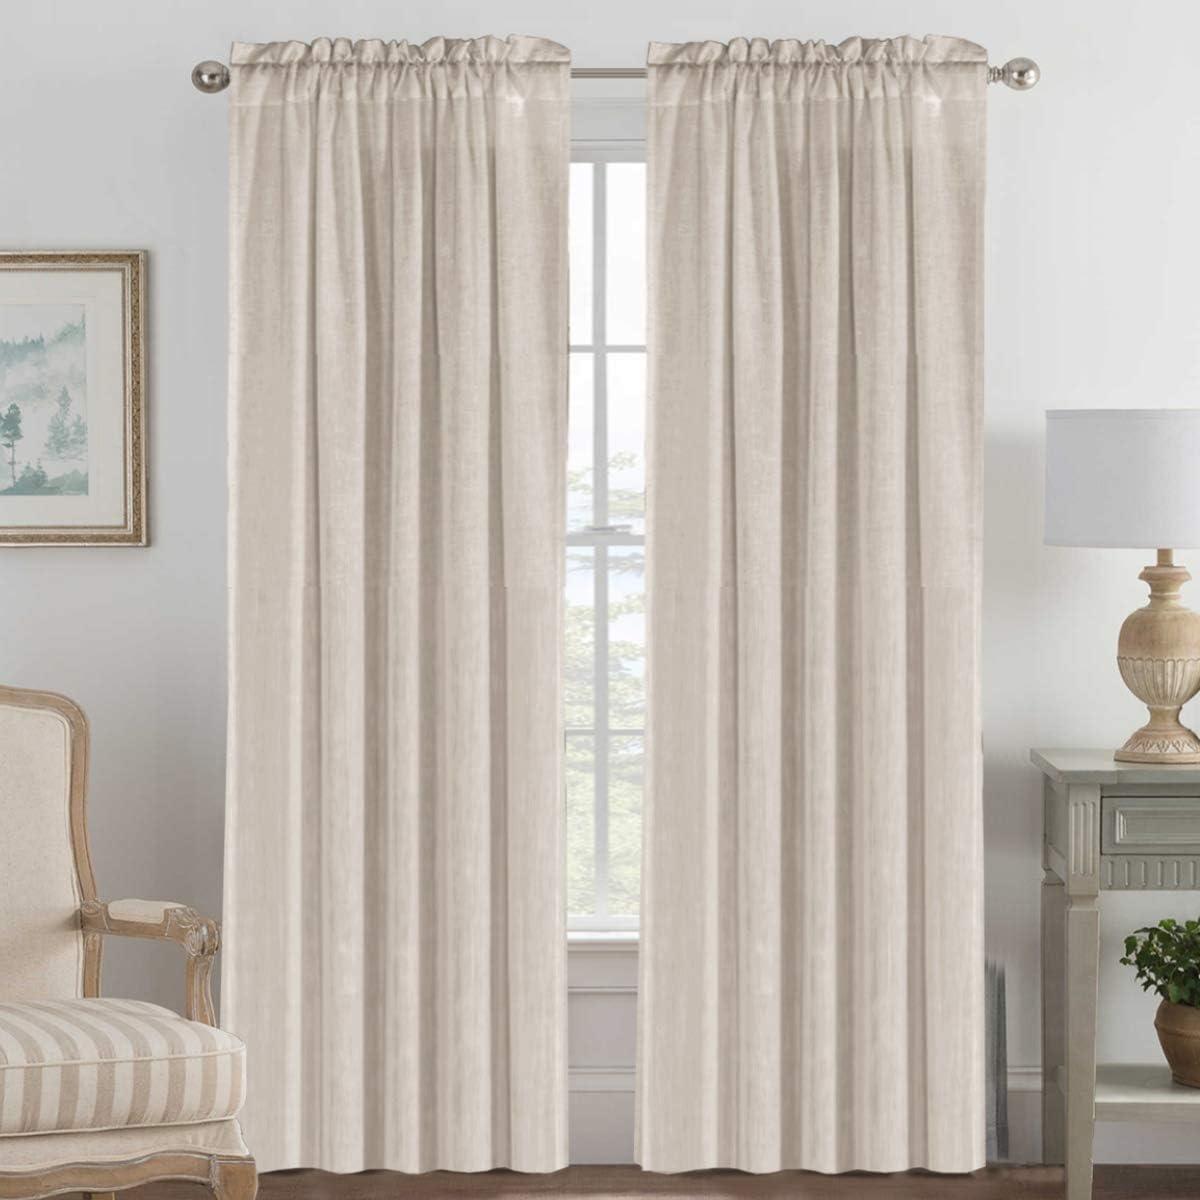 H.VERSAILTEX Pair Set Natural Linen Blended Window Treatment, Rod Pocket Top Premium Soft Rich Light Reducing Curtain Panels for Living Room - 52x84-Inch-Angora